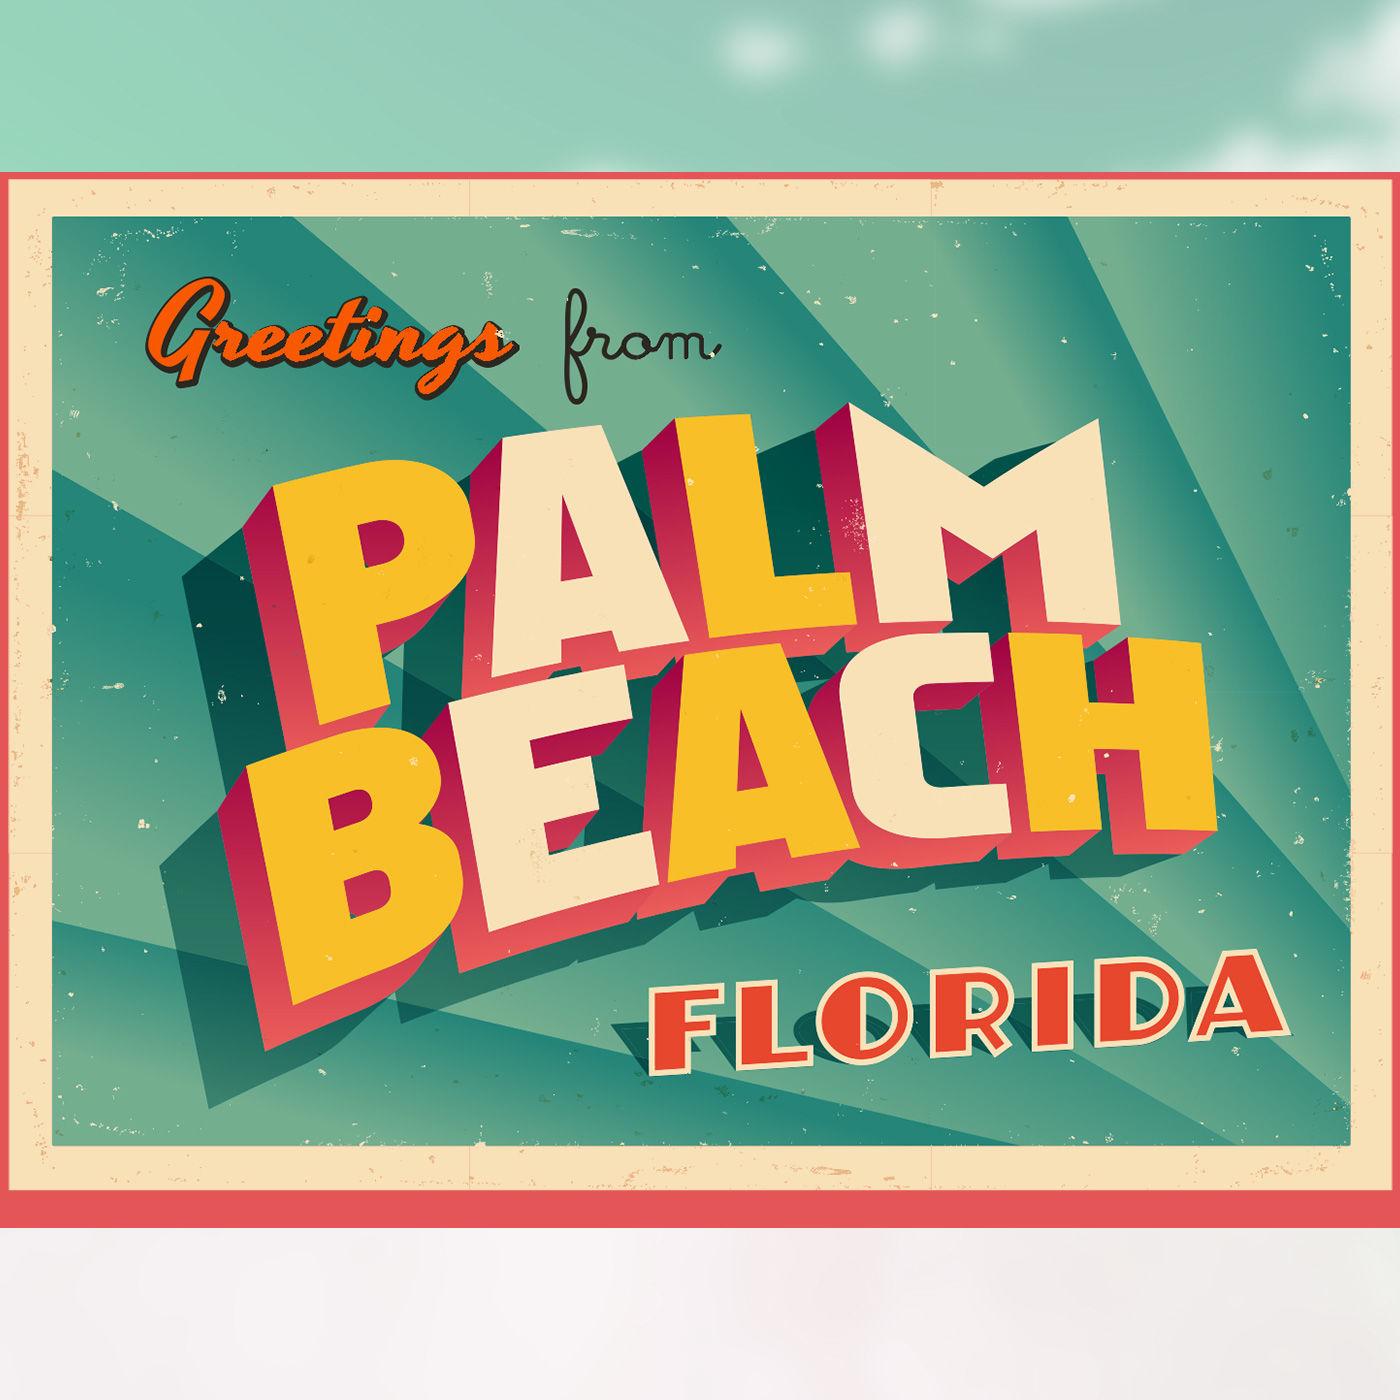 Housing Affordability, Part 1: Palm Beach County, Florida